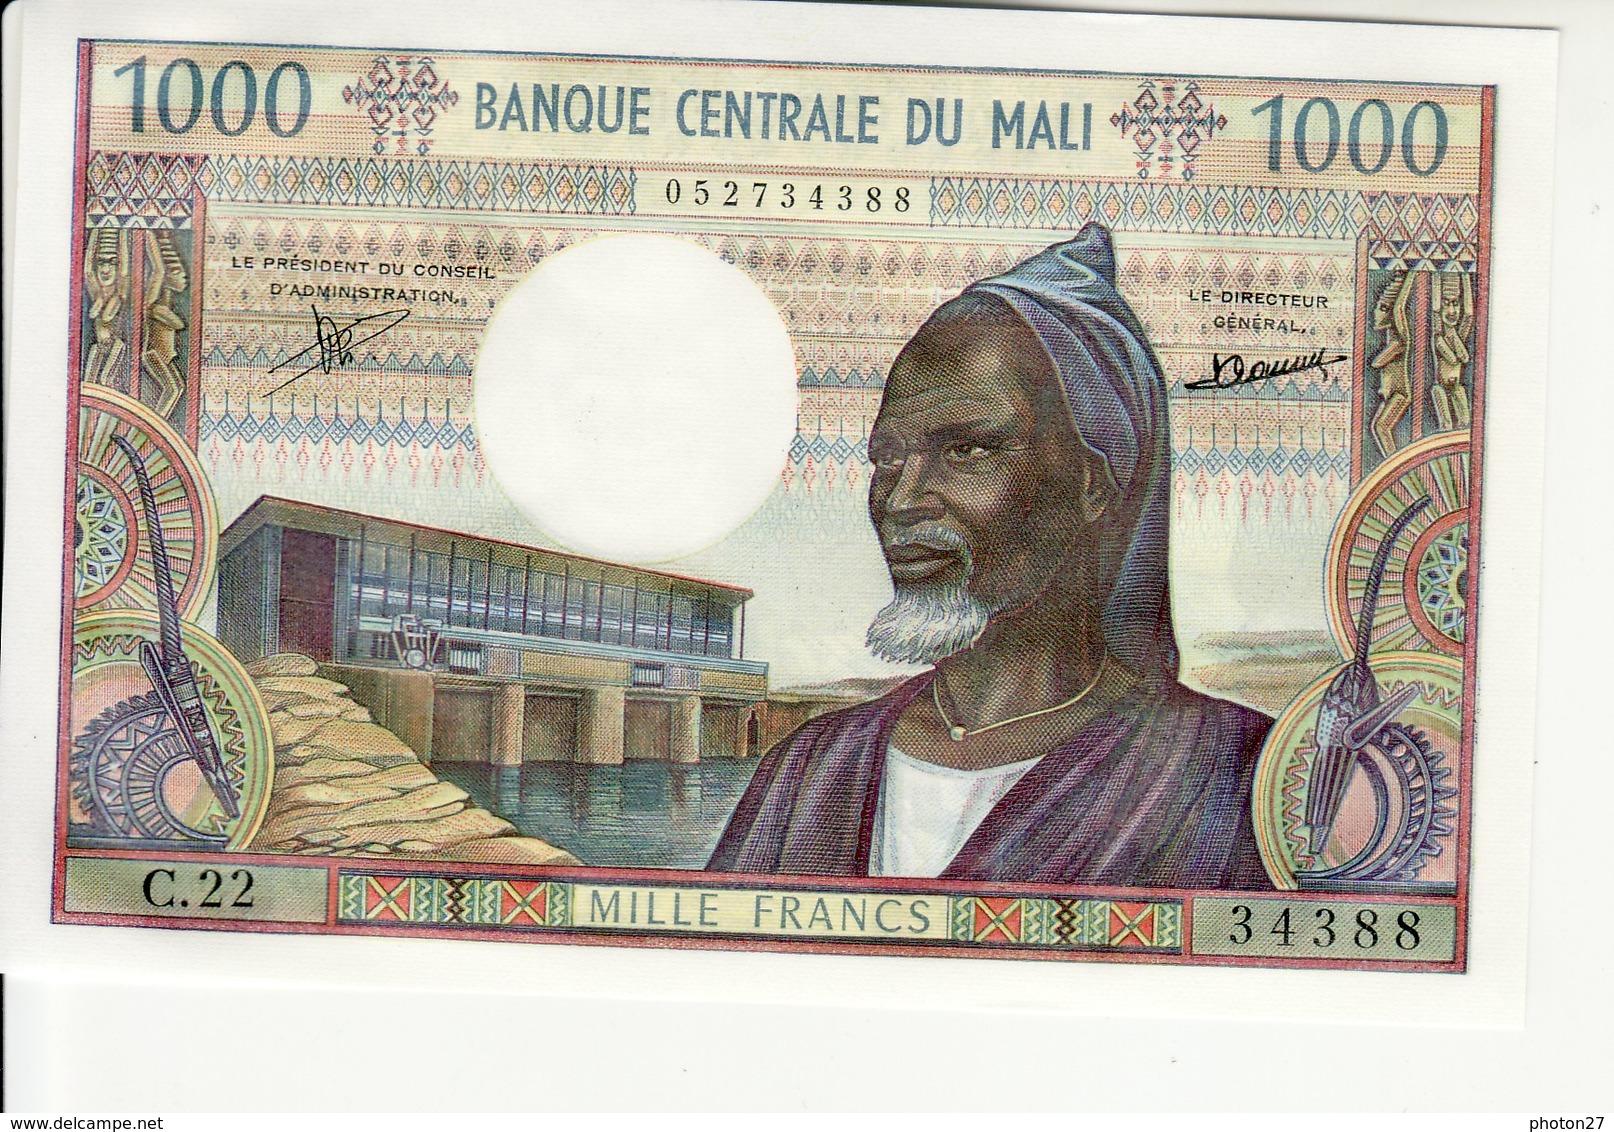 Mali - 1000 Francs - Mali